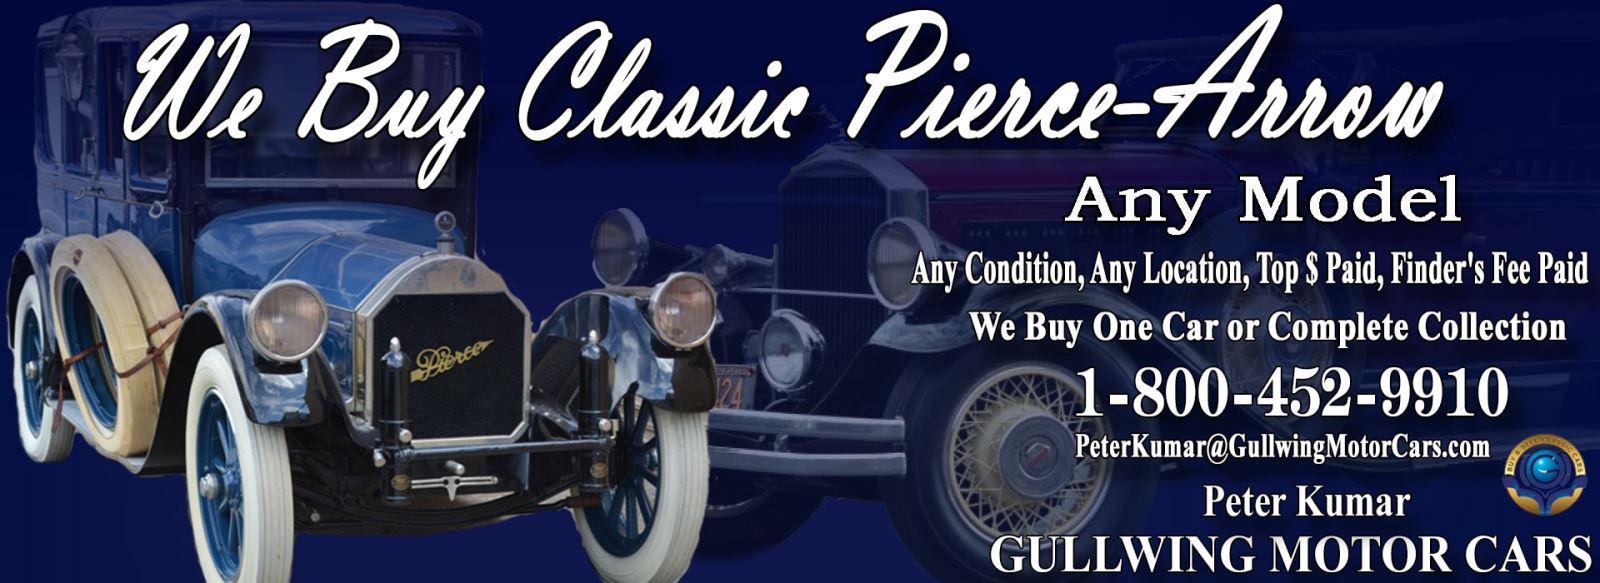 Classic Pierce Arrow for sale, we buy vintage Pierce Arrow. Call Peter Kumar. Gullwing Motor